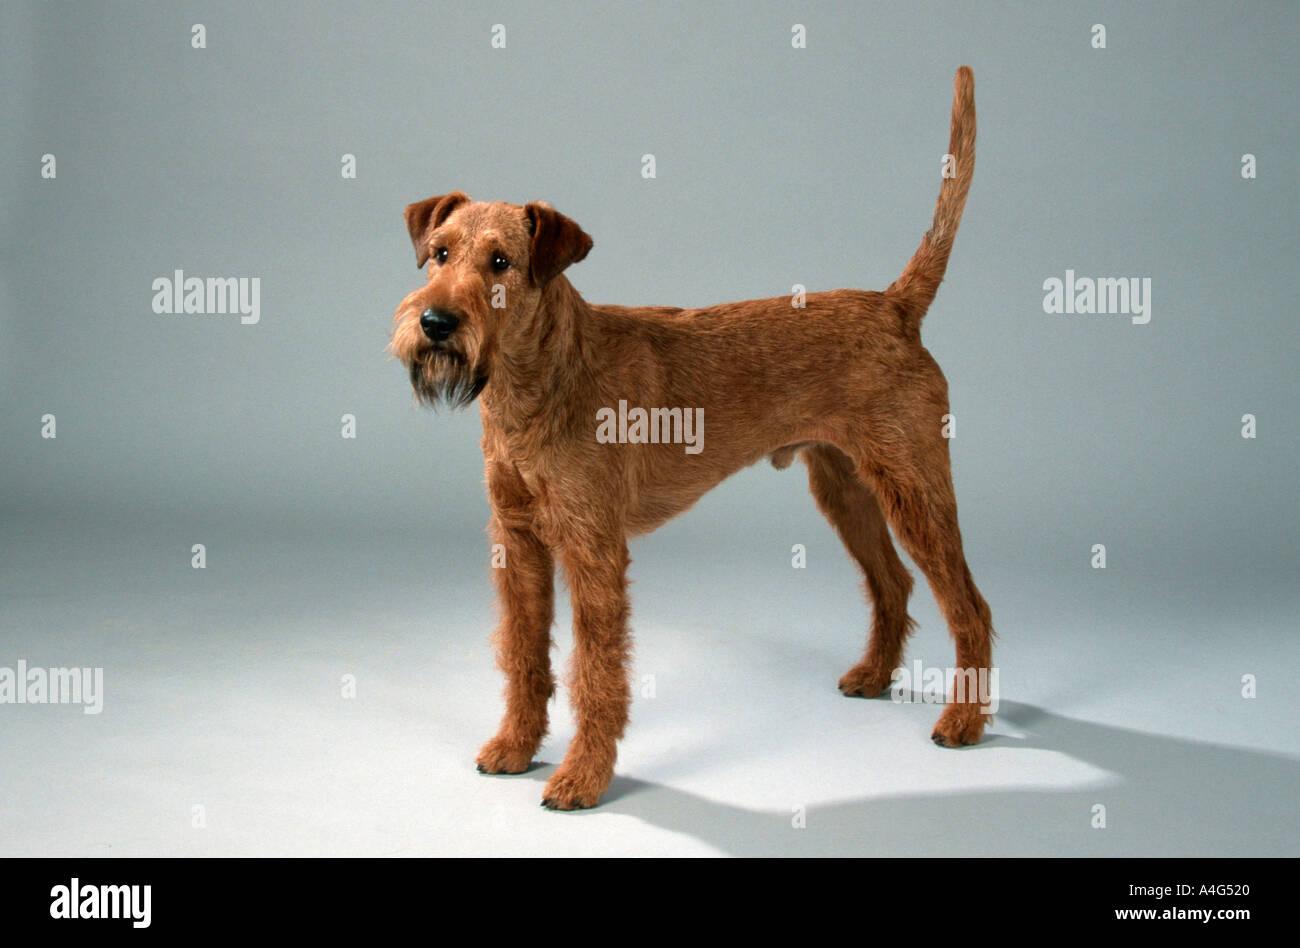 irish terrier mammals animals domestic dog pet cut out object studio